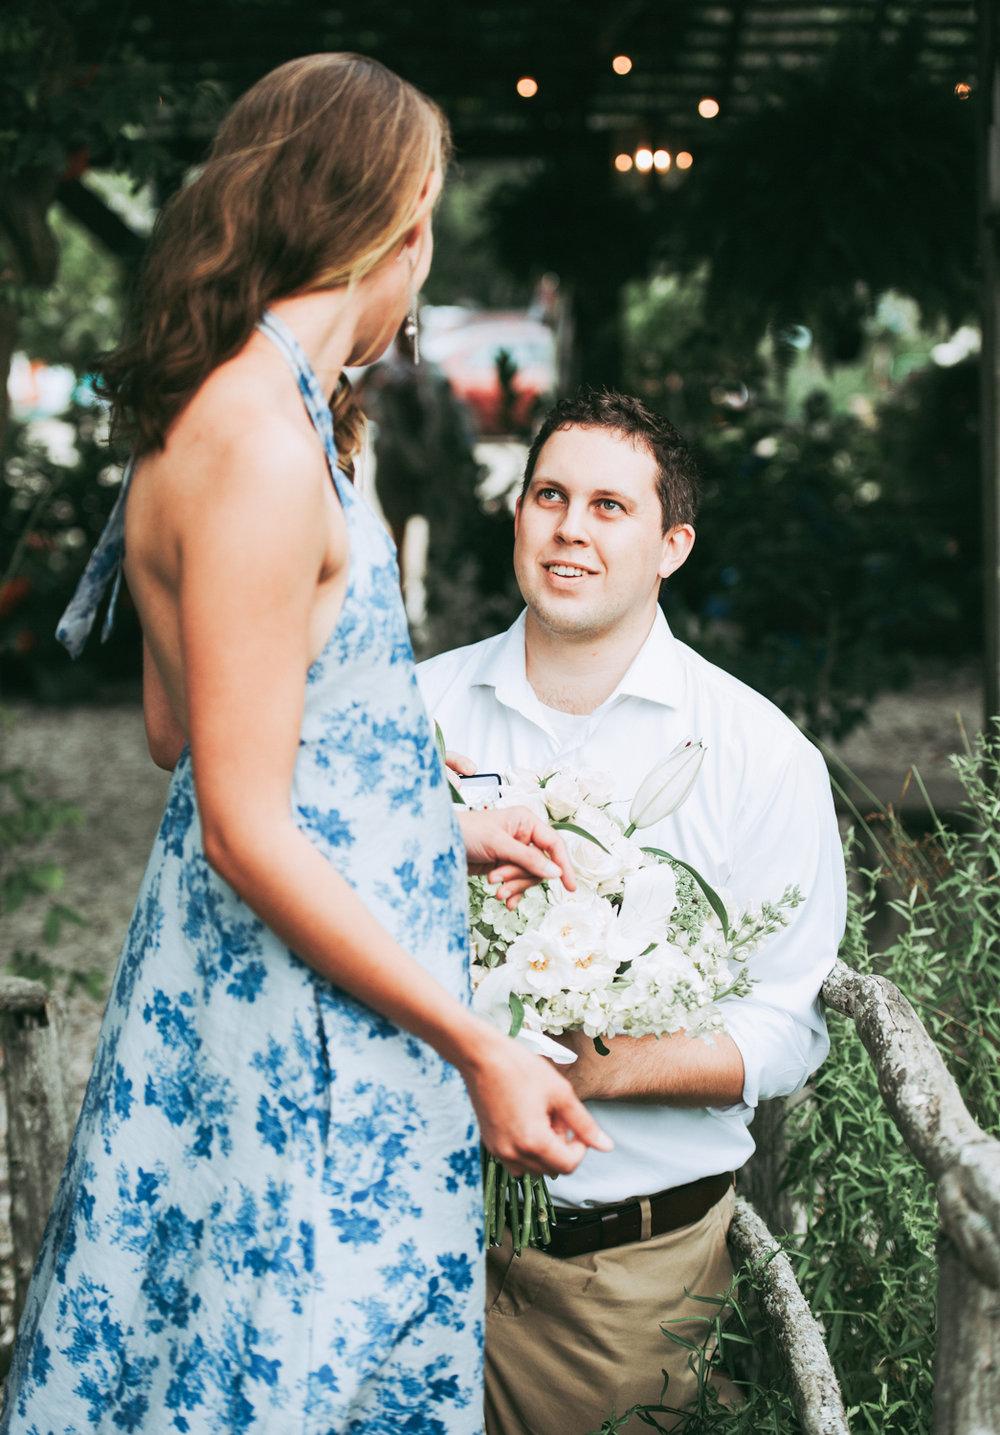 hilary_brian_engagement_marry_me-3596.jpg